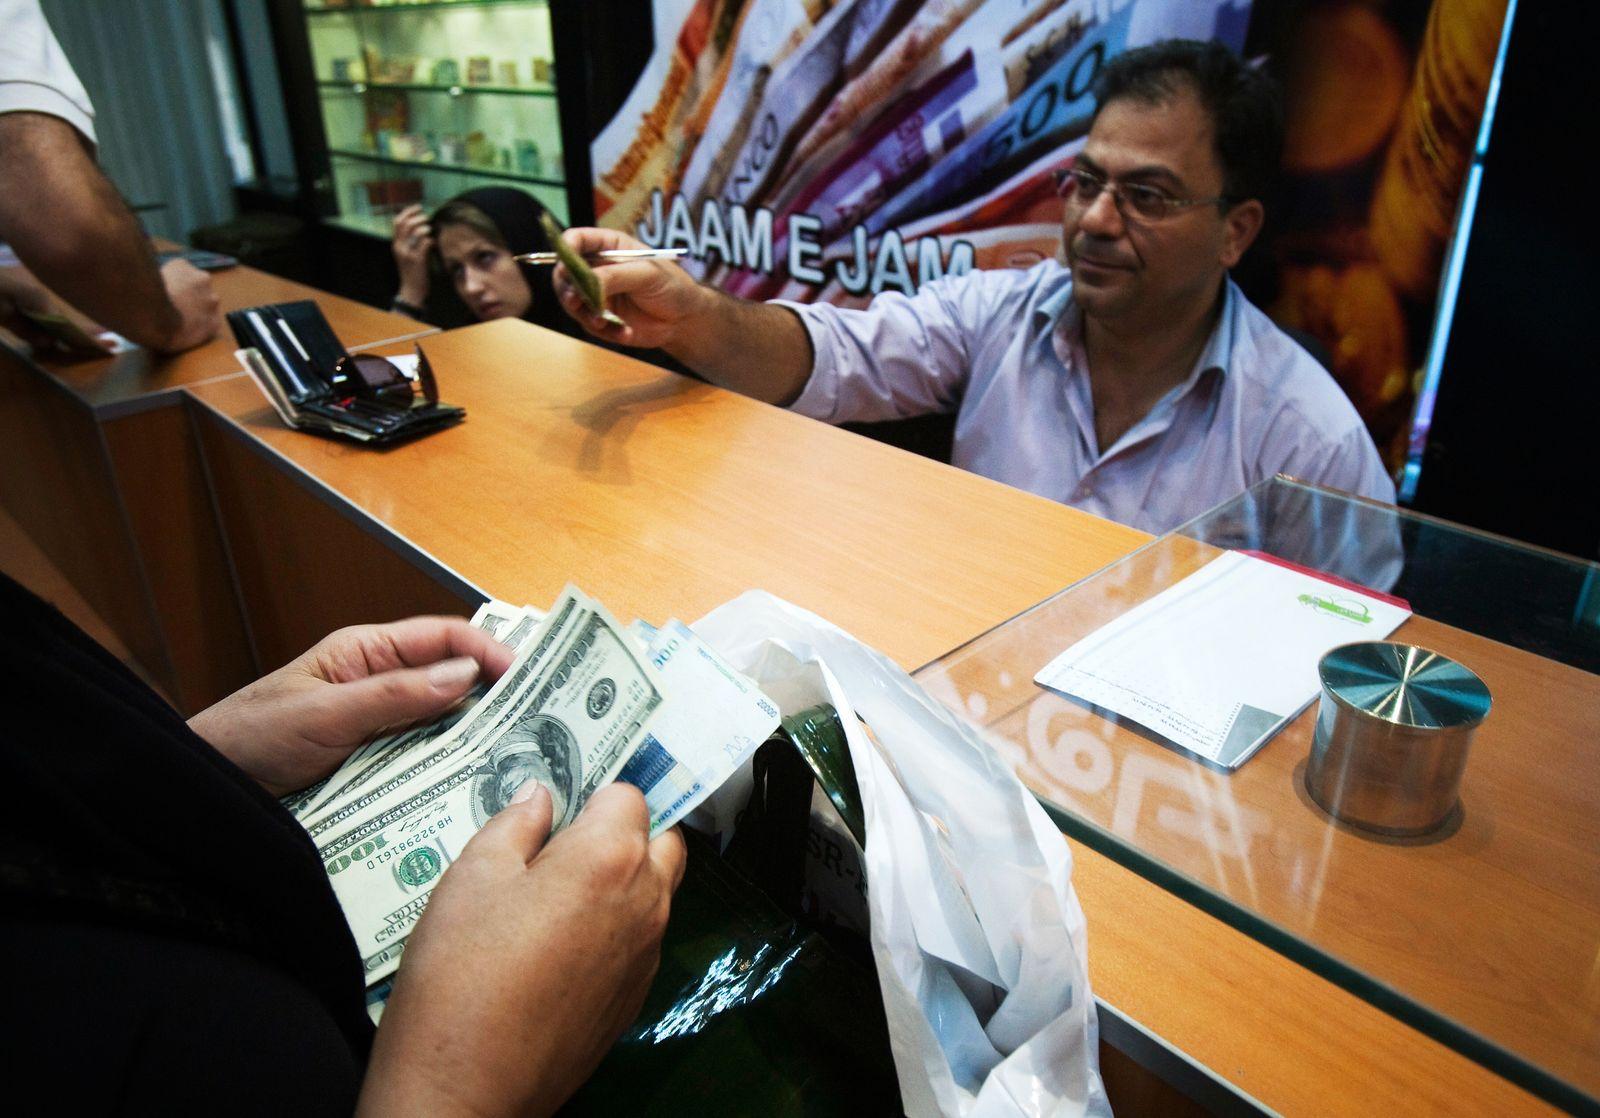 Iran / Teheran / Dollar / Wechsel-Stube / Bank